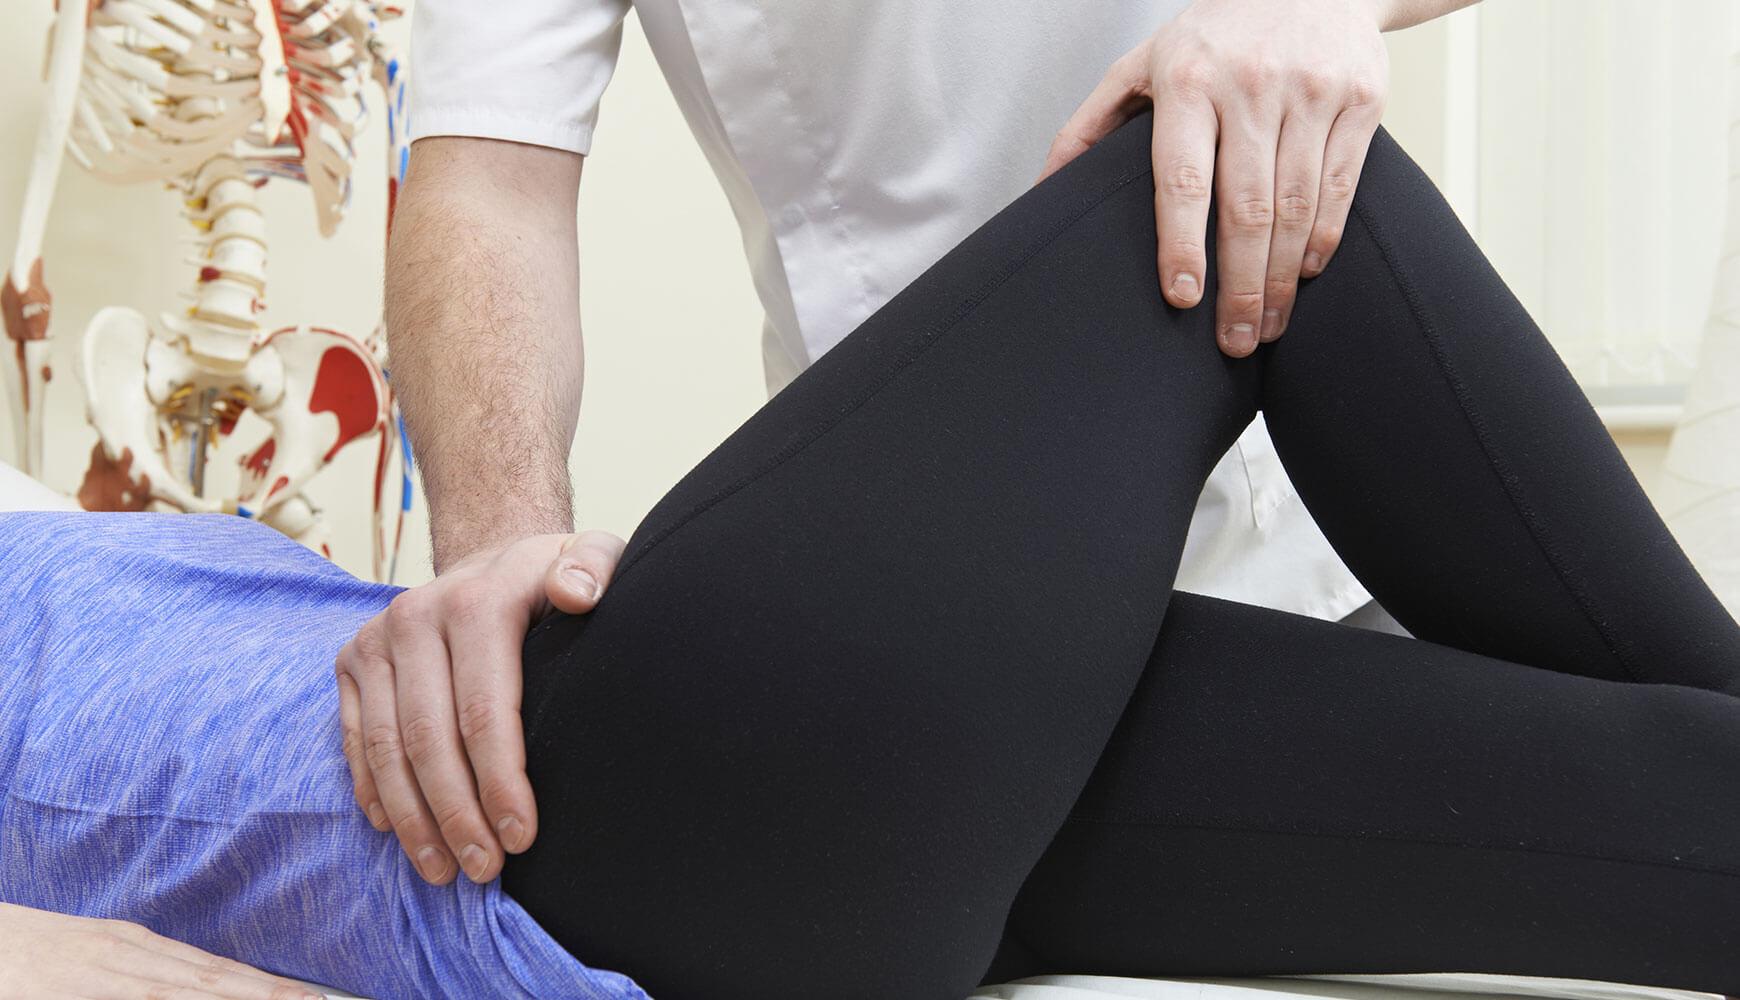 chirurgia-protesica-anca-ginocchio-roma